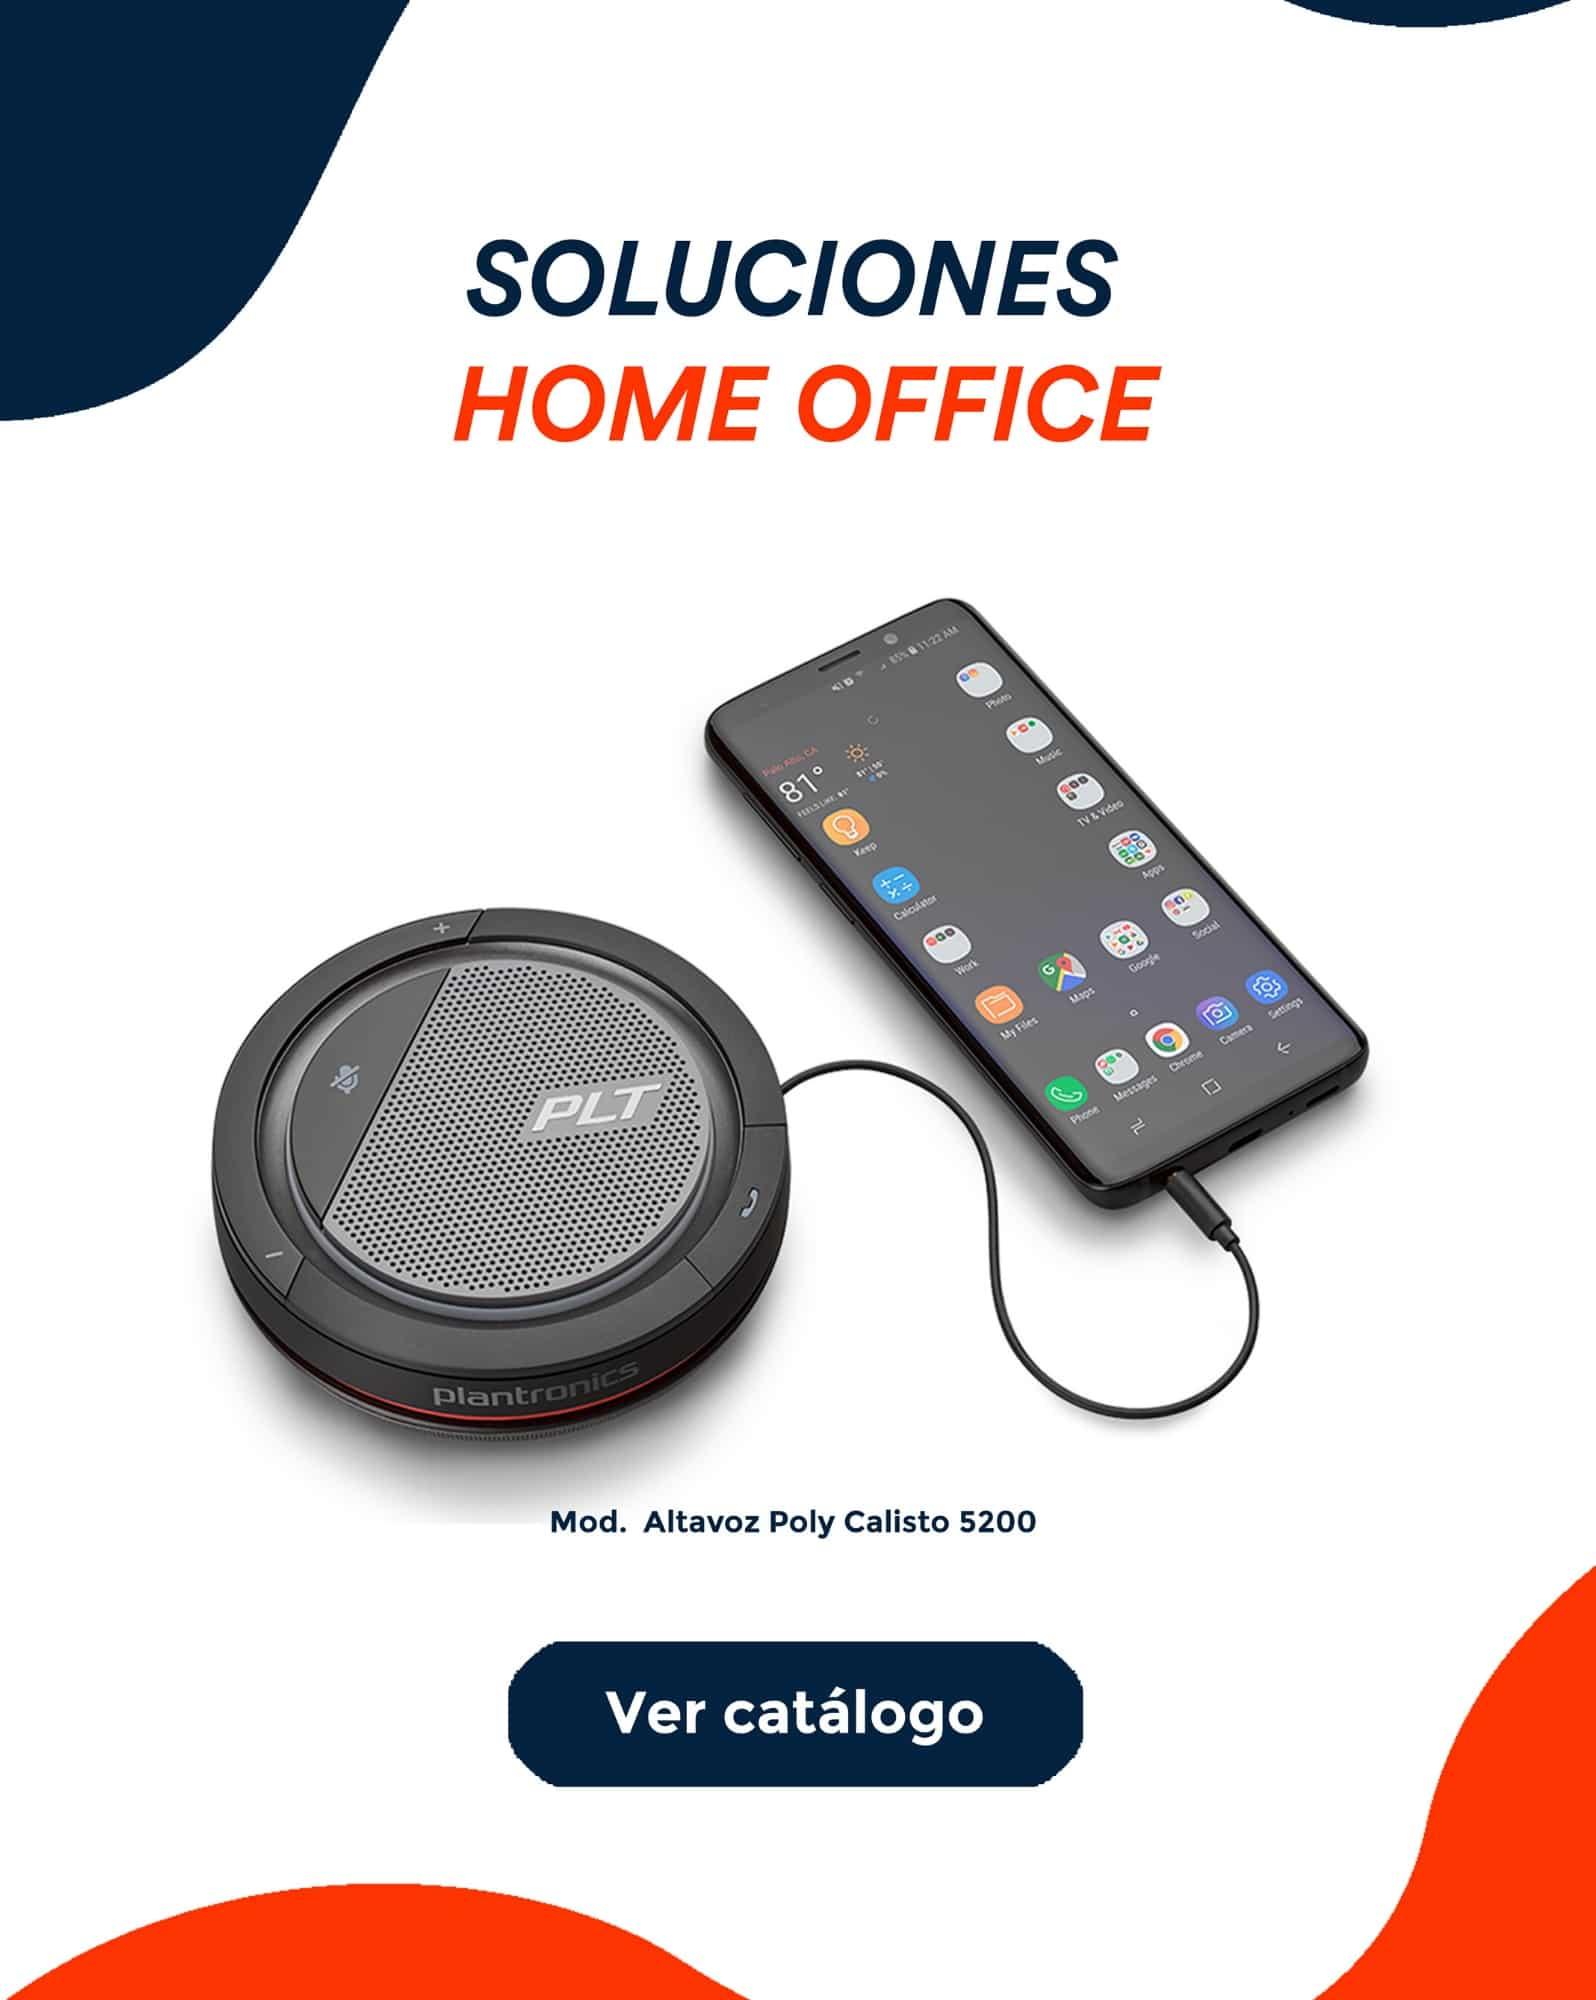 SOLUCIONES HOME OFFICE